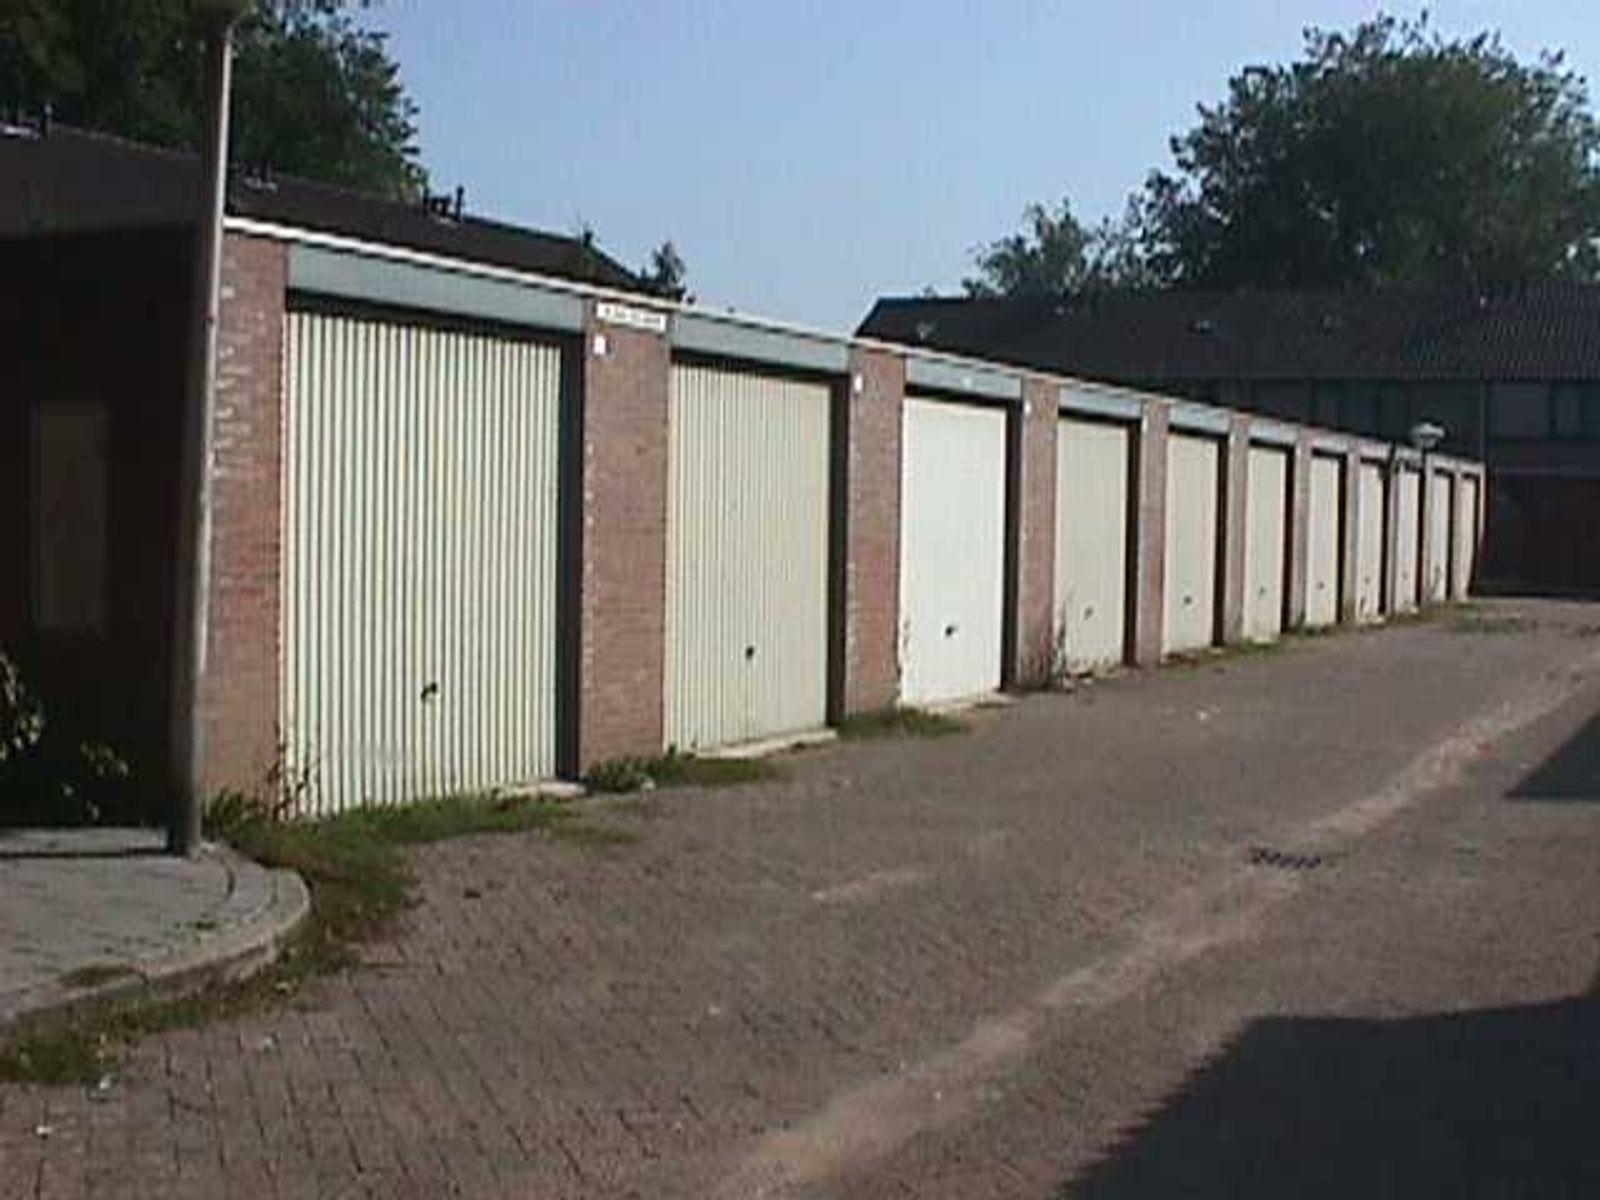 Huurwoning Met Garage : Tag huurwoning van werkhoven makelaars